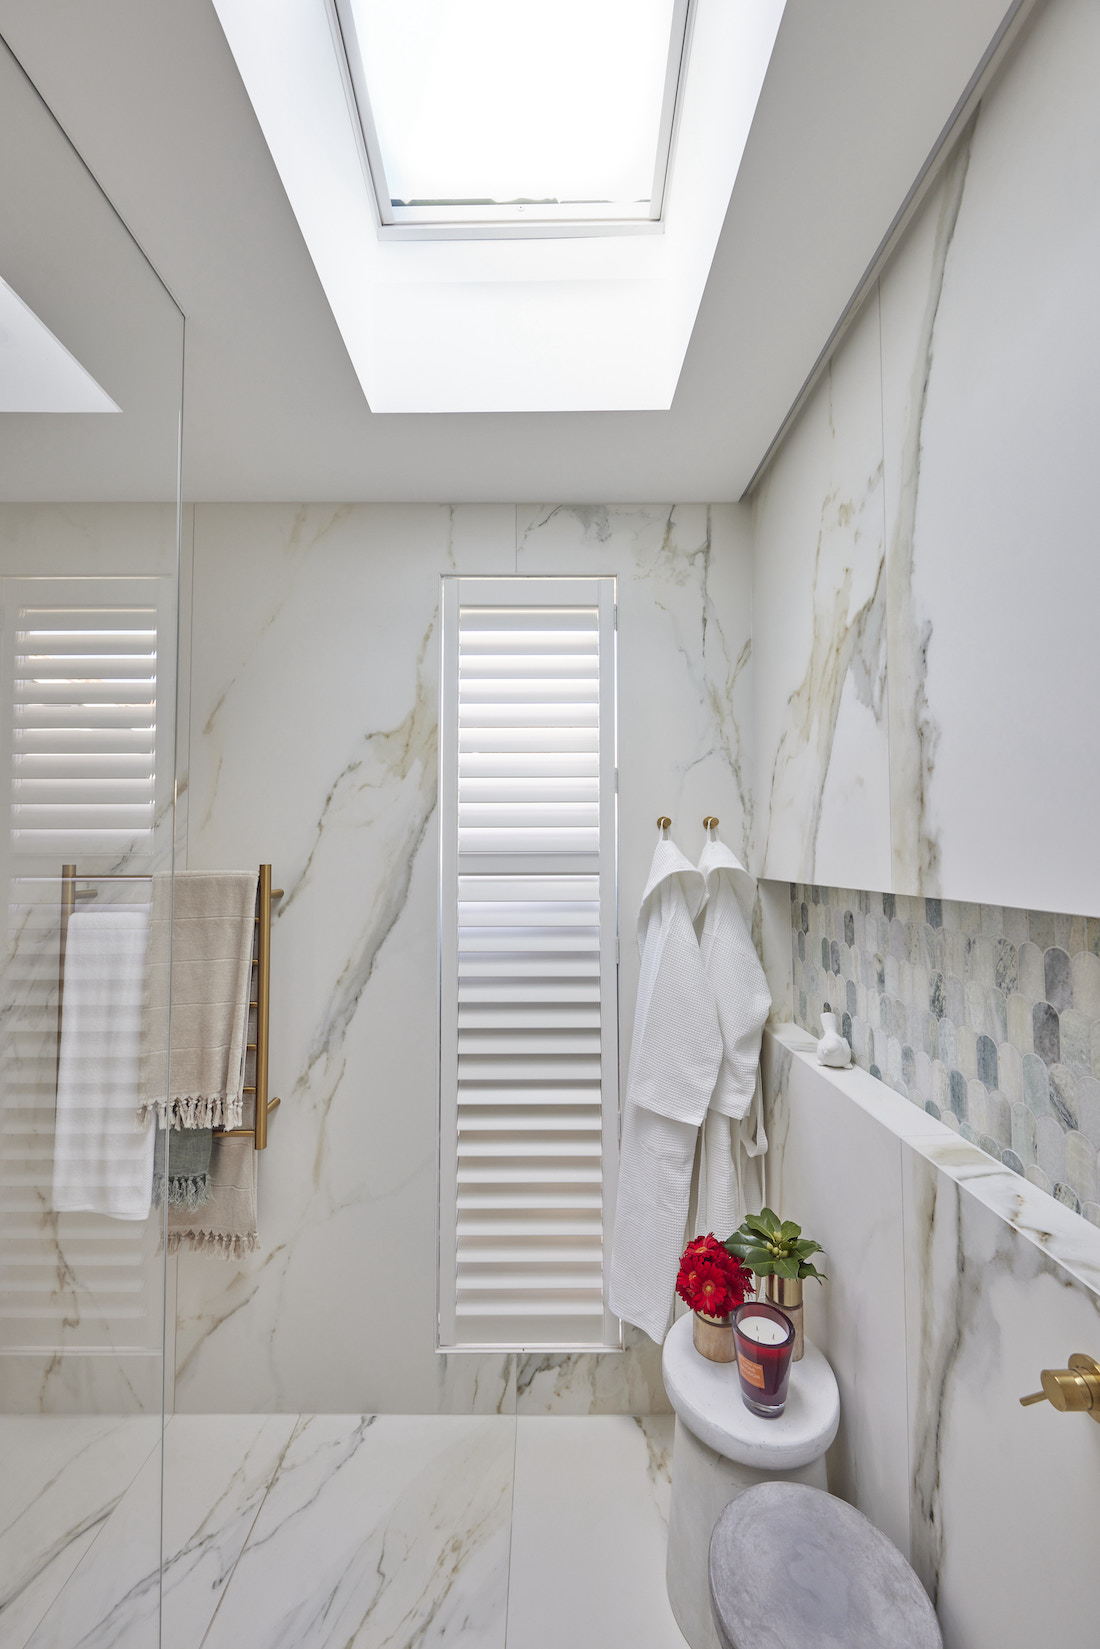 Shutters in marble bathroom